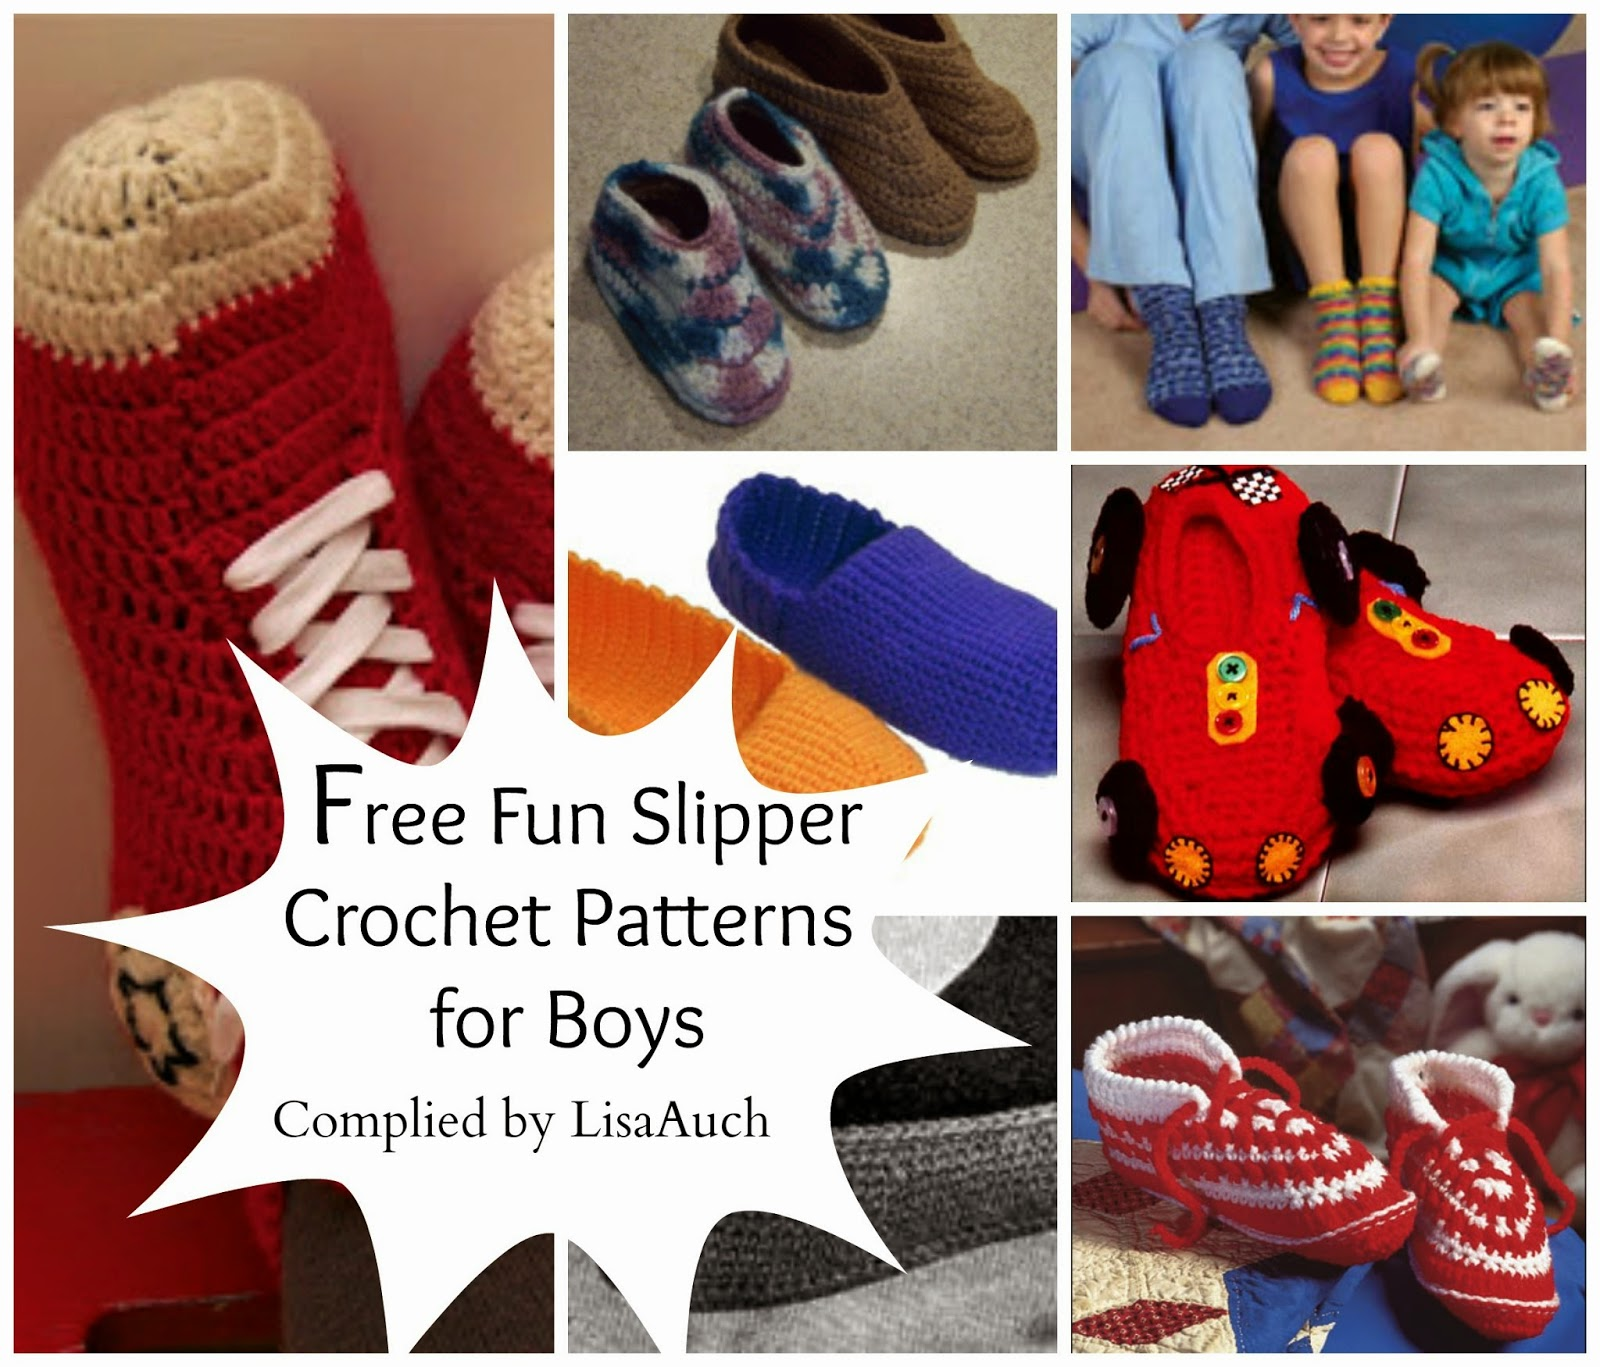 Free Crochet Slipper Patterns For Boys Free Crochet Patterns